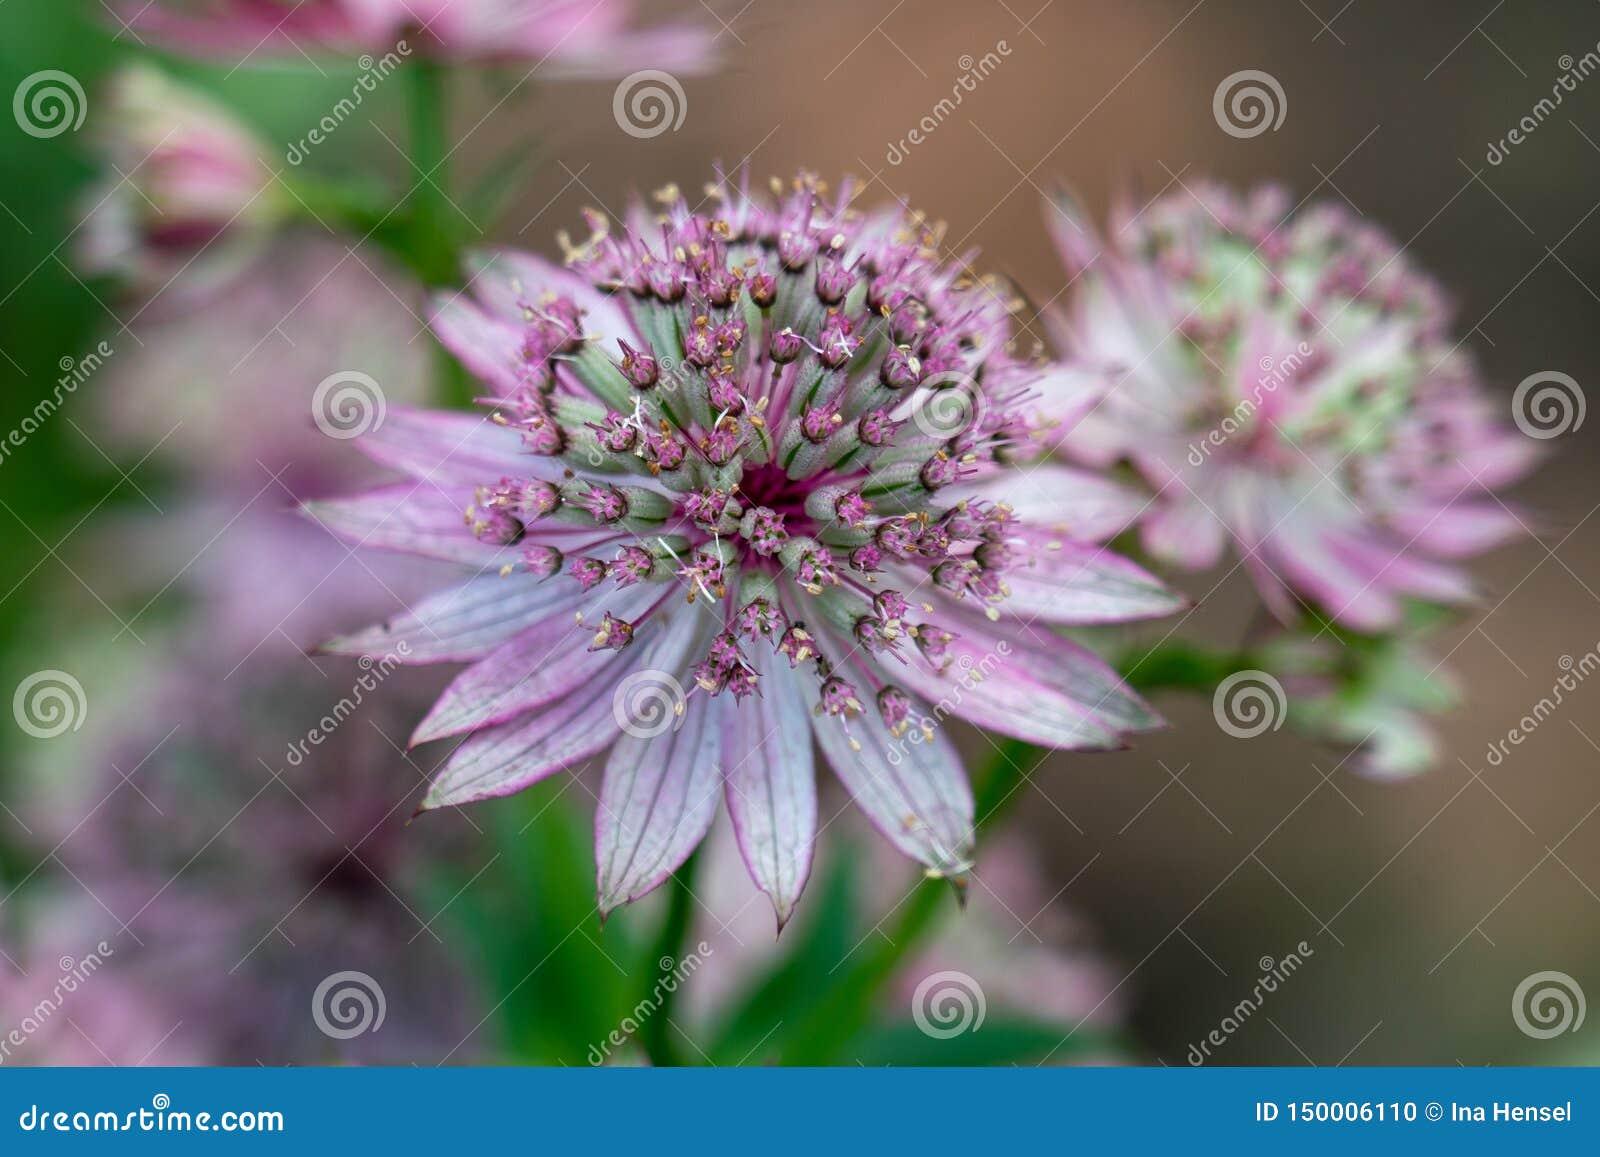 Astrantia主要陈列一朵桃红色花的宏指令象雌蕊和花粉的许多细节